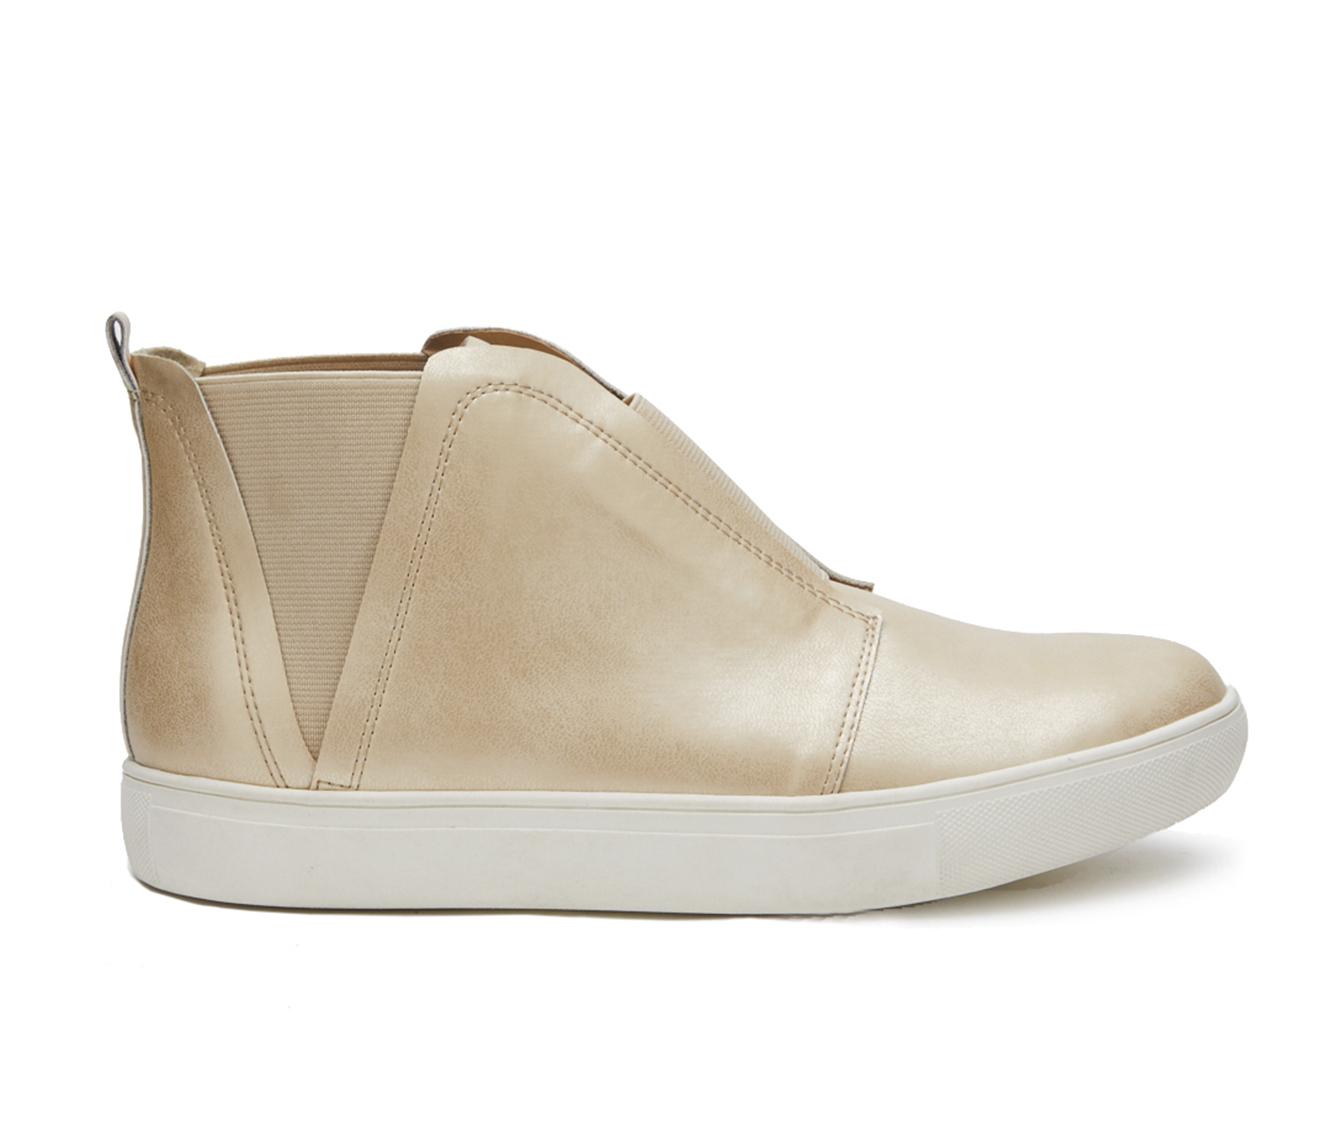 Coconuts Love Worn Women's Shoe (Gold Faux Leather)